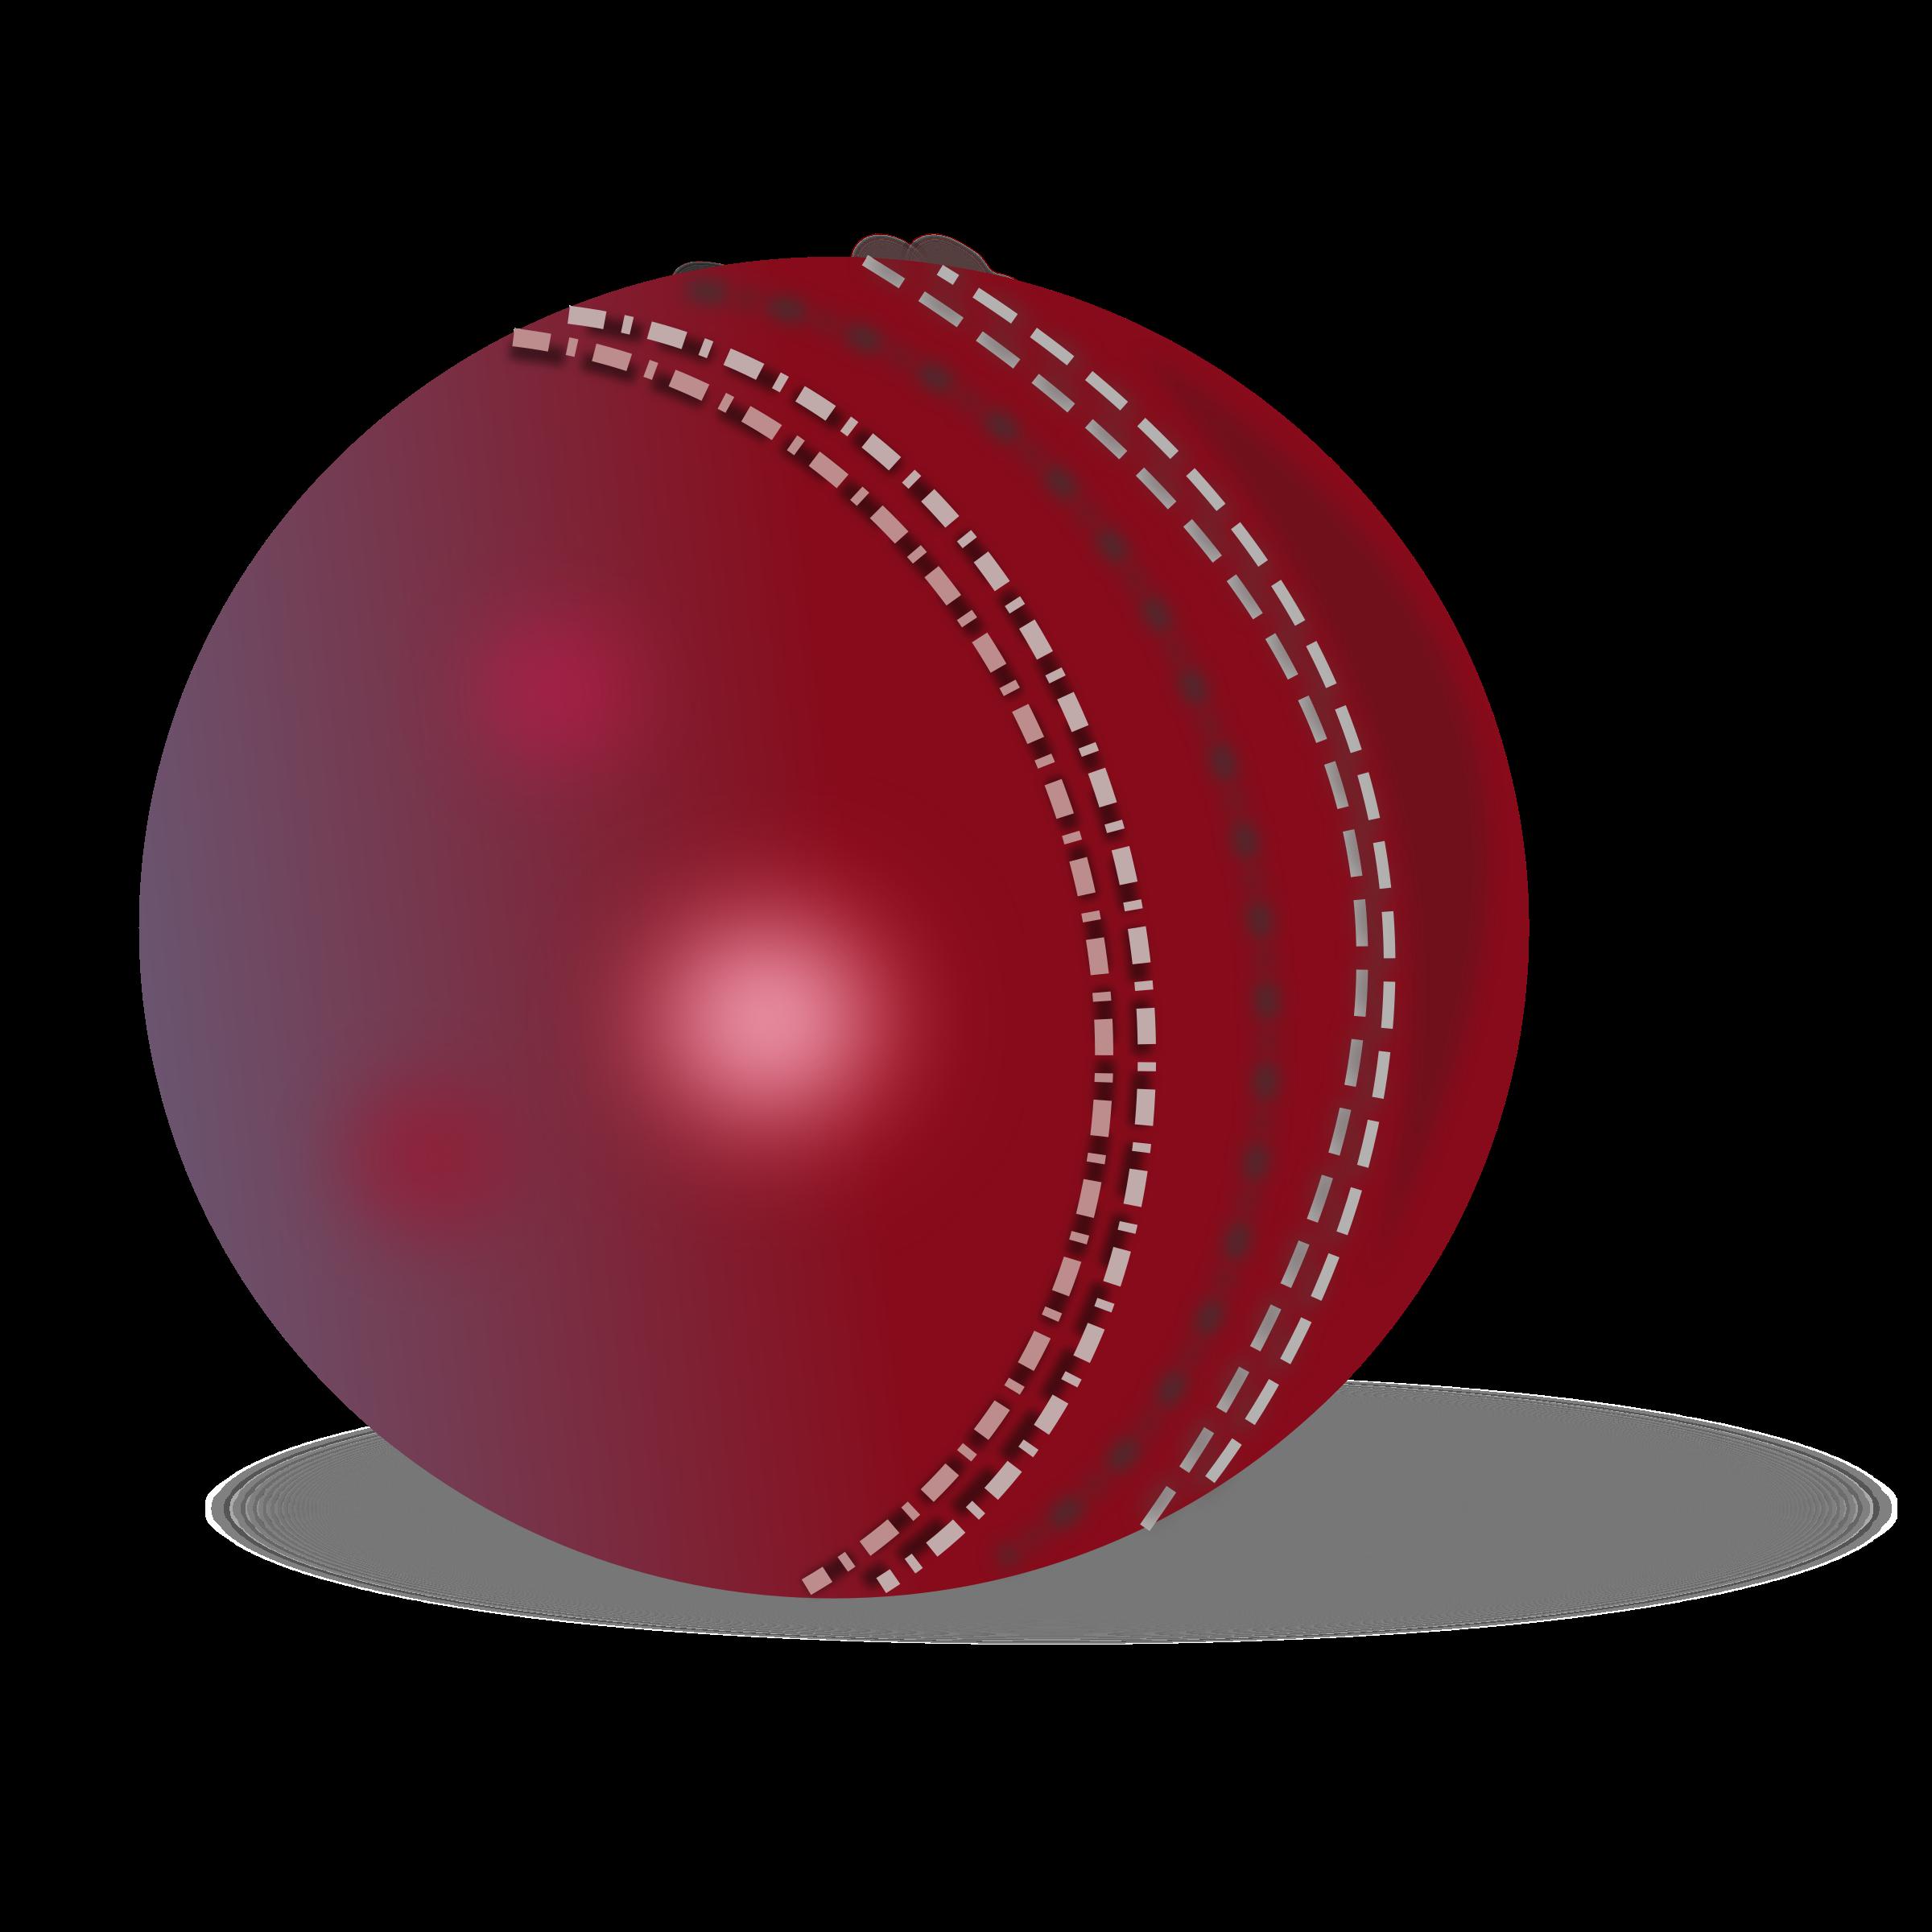 PNG Cricket Ball - 133488